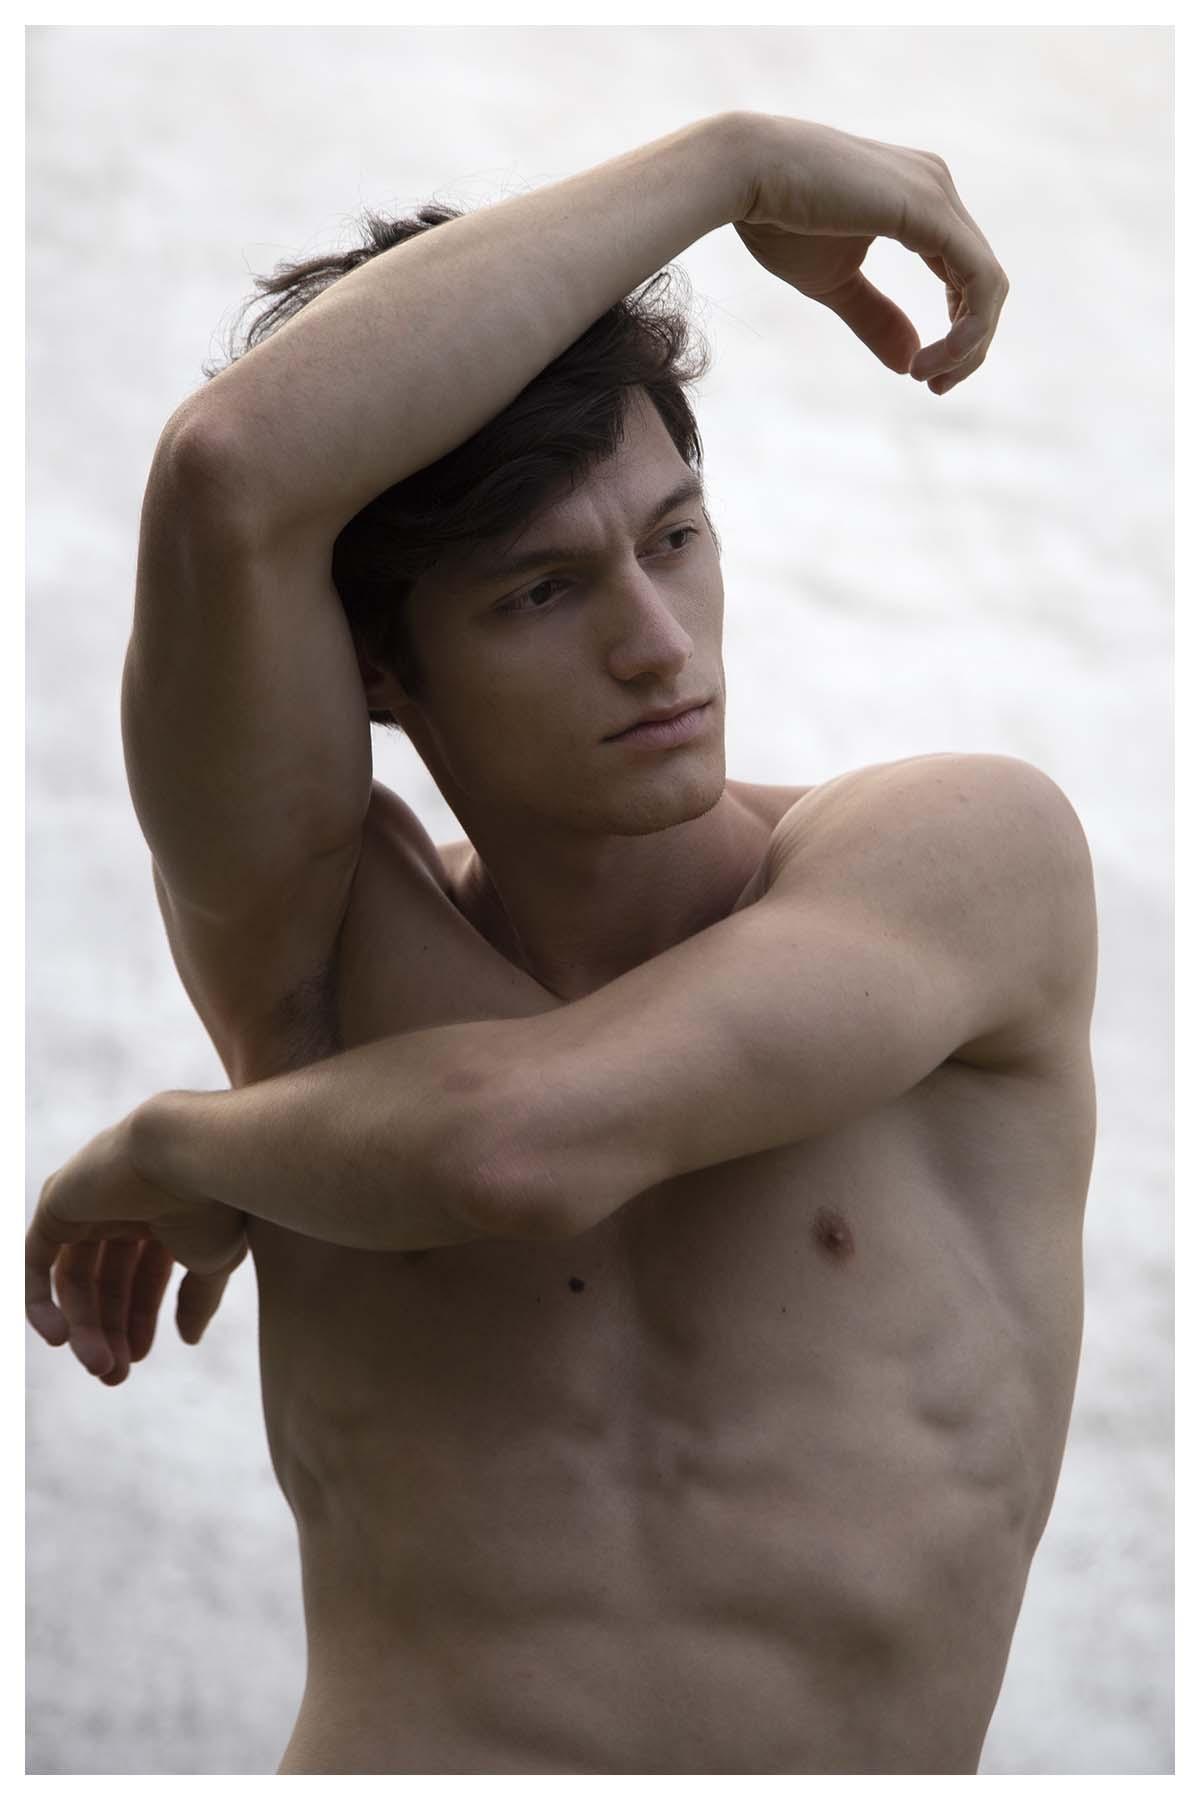 Igor Botassini and Luciano Carrizo by Filipe Galgani for Brazilian Male Model